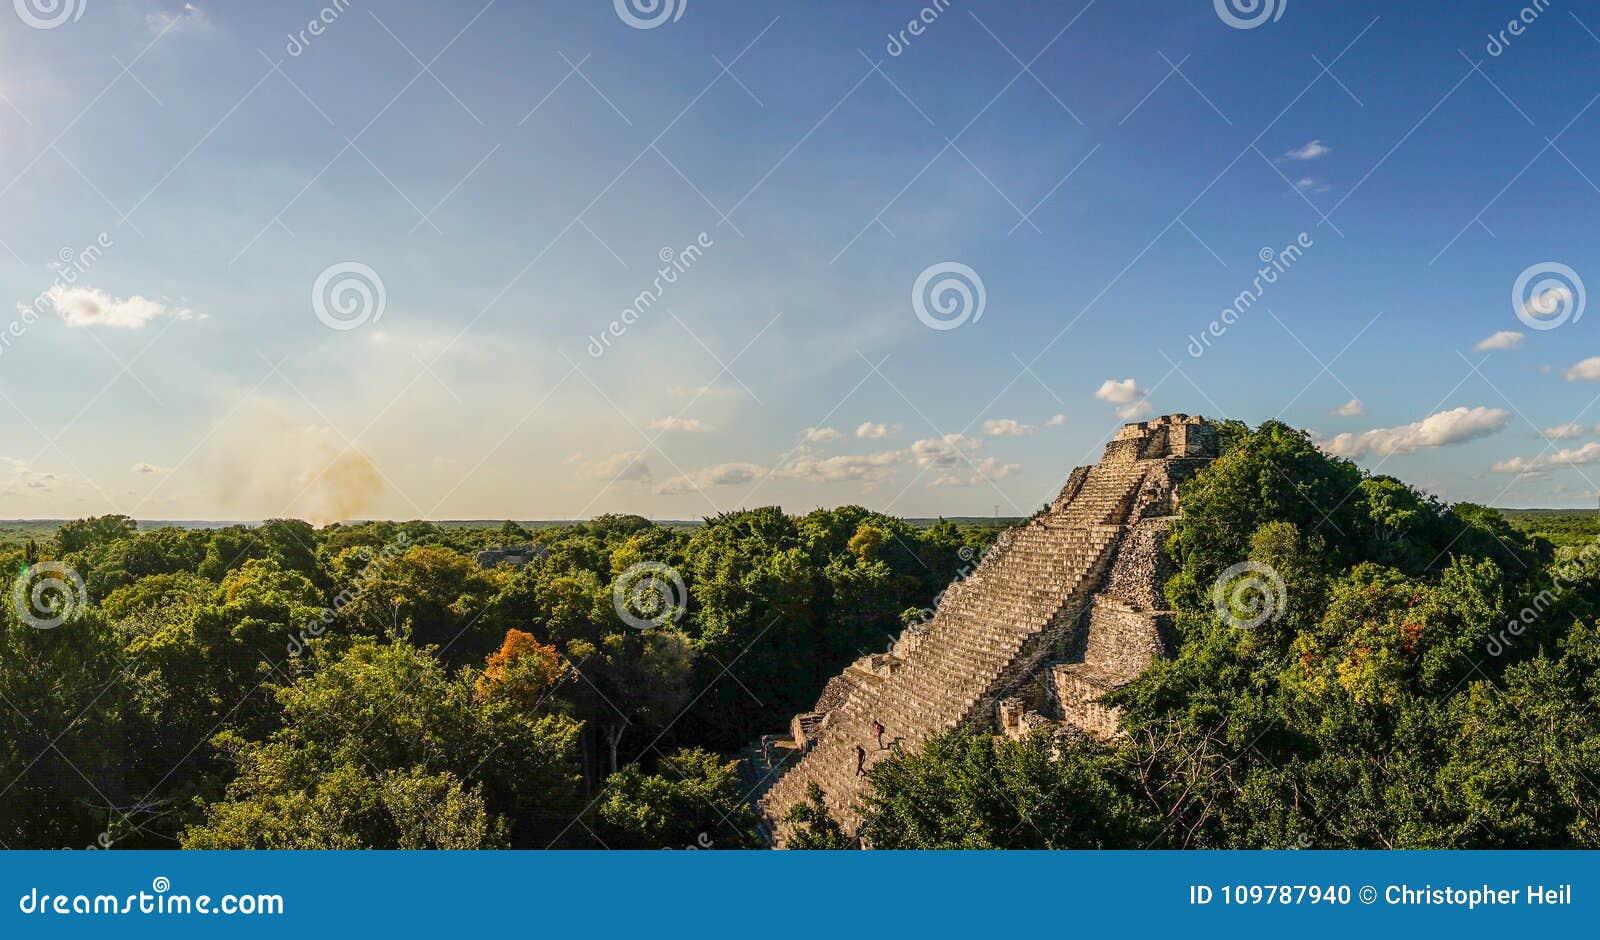 Becan maya temple in the Yucatan, Mexico.